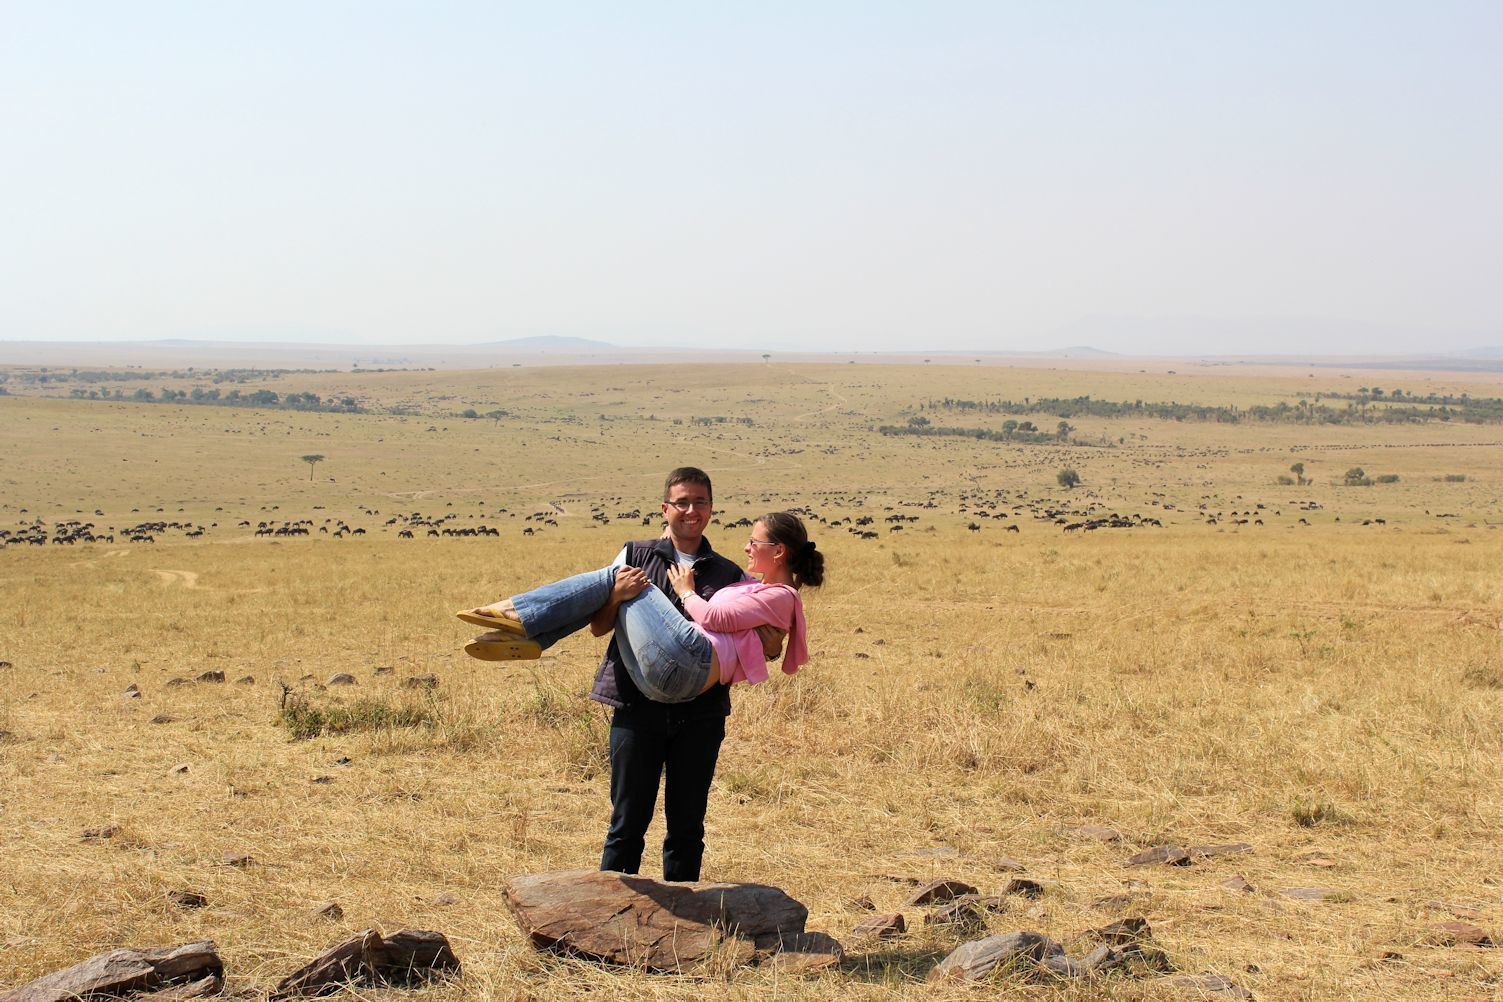 Maasai Mara in Kenya, July 2013